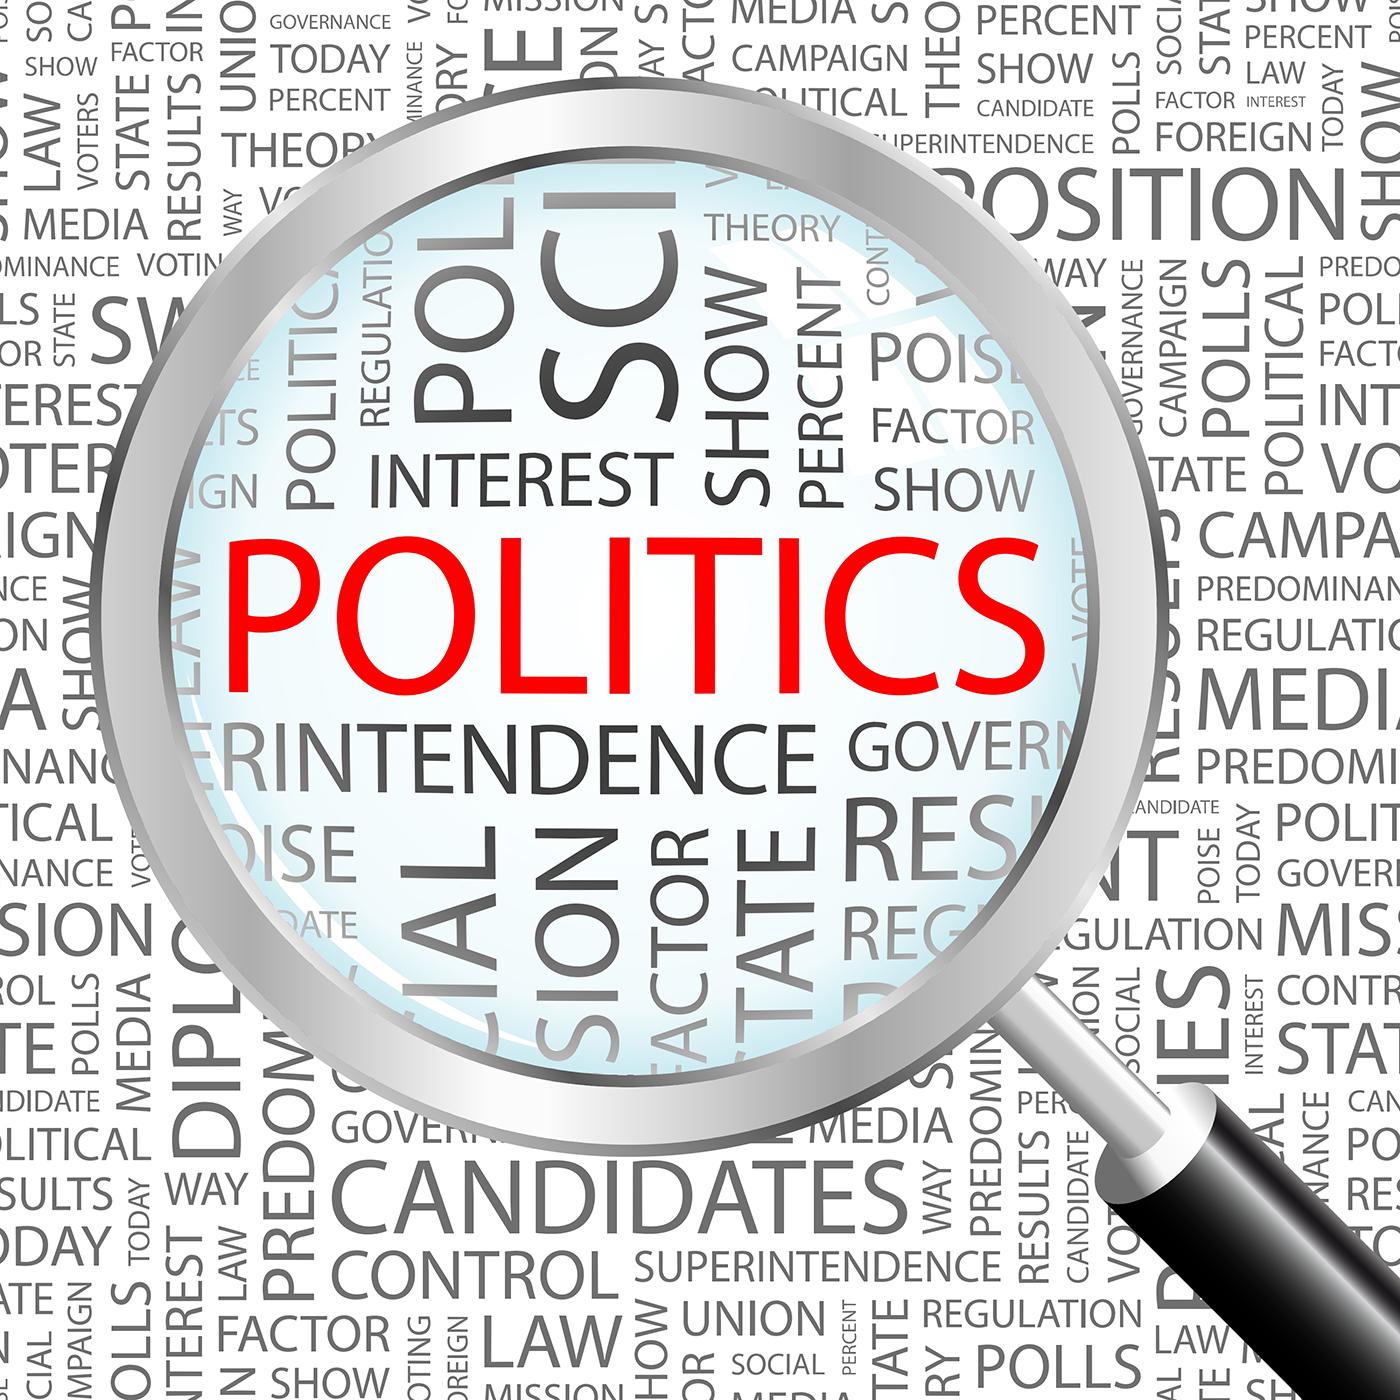 World Politics Clipart.